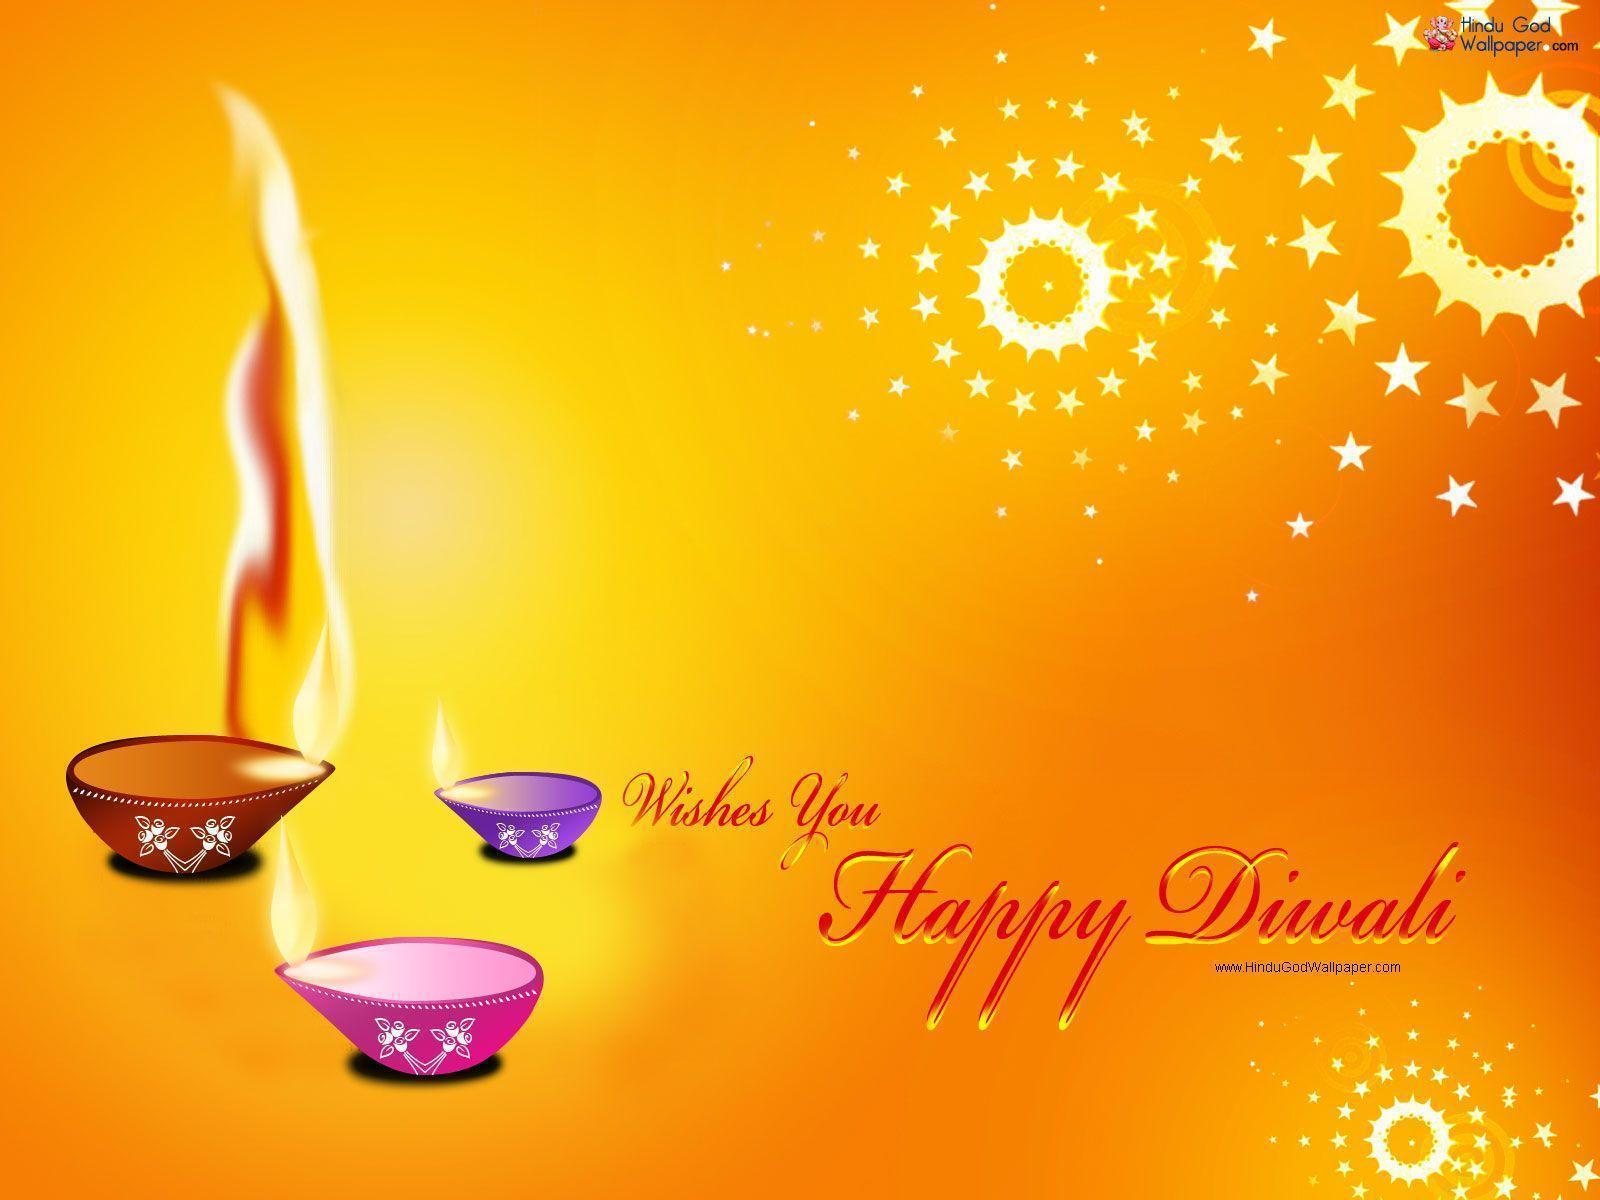 Happy Diwali 2016 HD Wallpaper | Funny Diwali Wallpapers | Daily ...